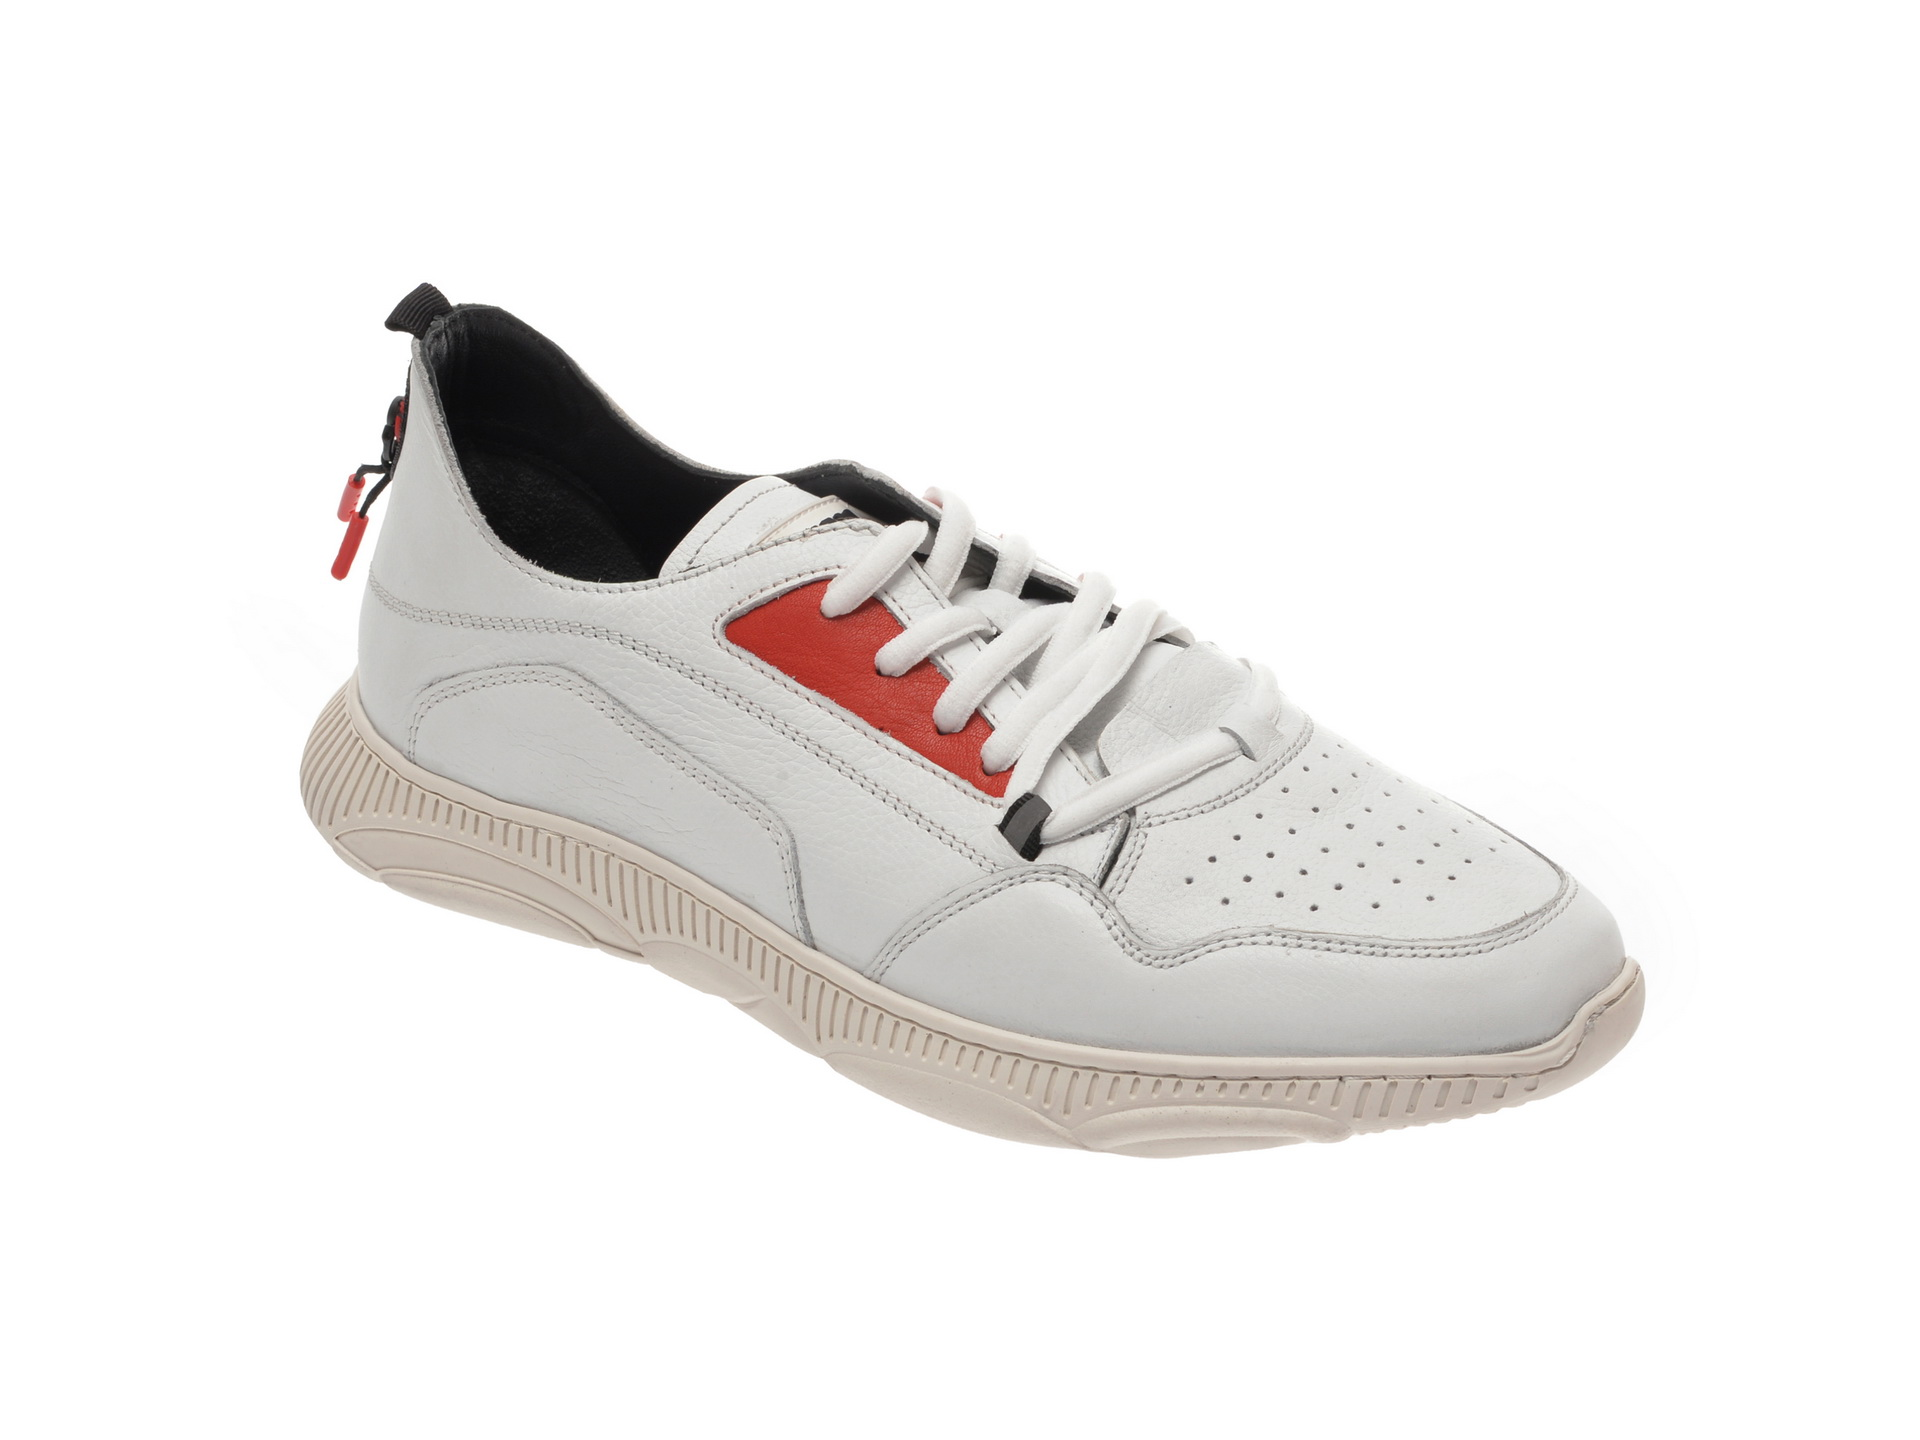 Pantofi sport OTTER albi, 37101, din piele naturala imagine